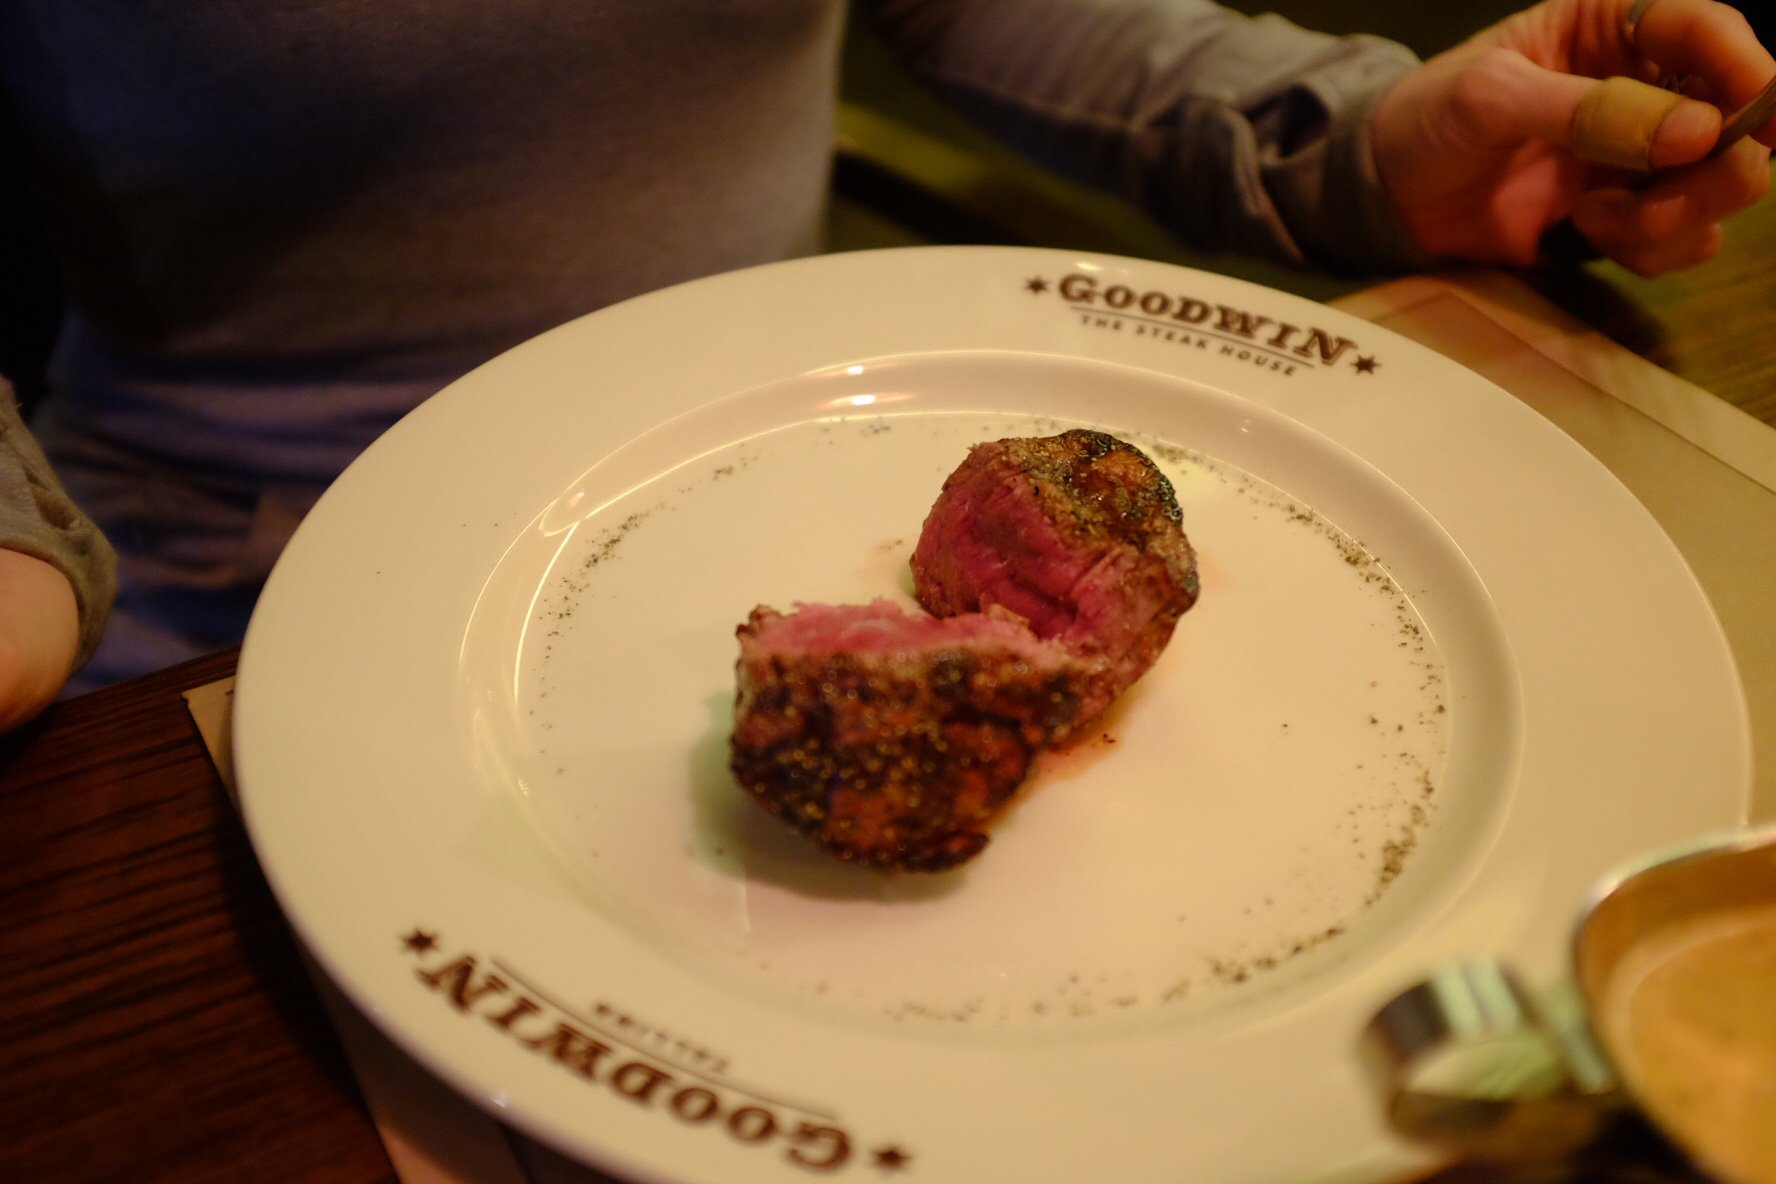 Beefsteak at the Goodwin in Tallinn